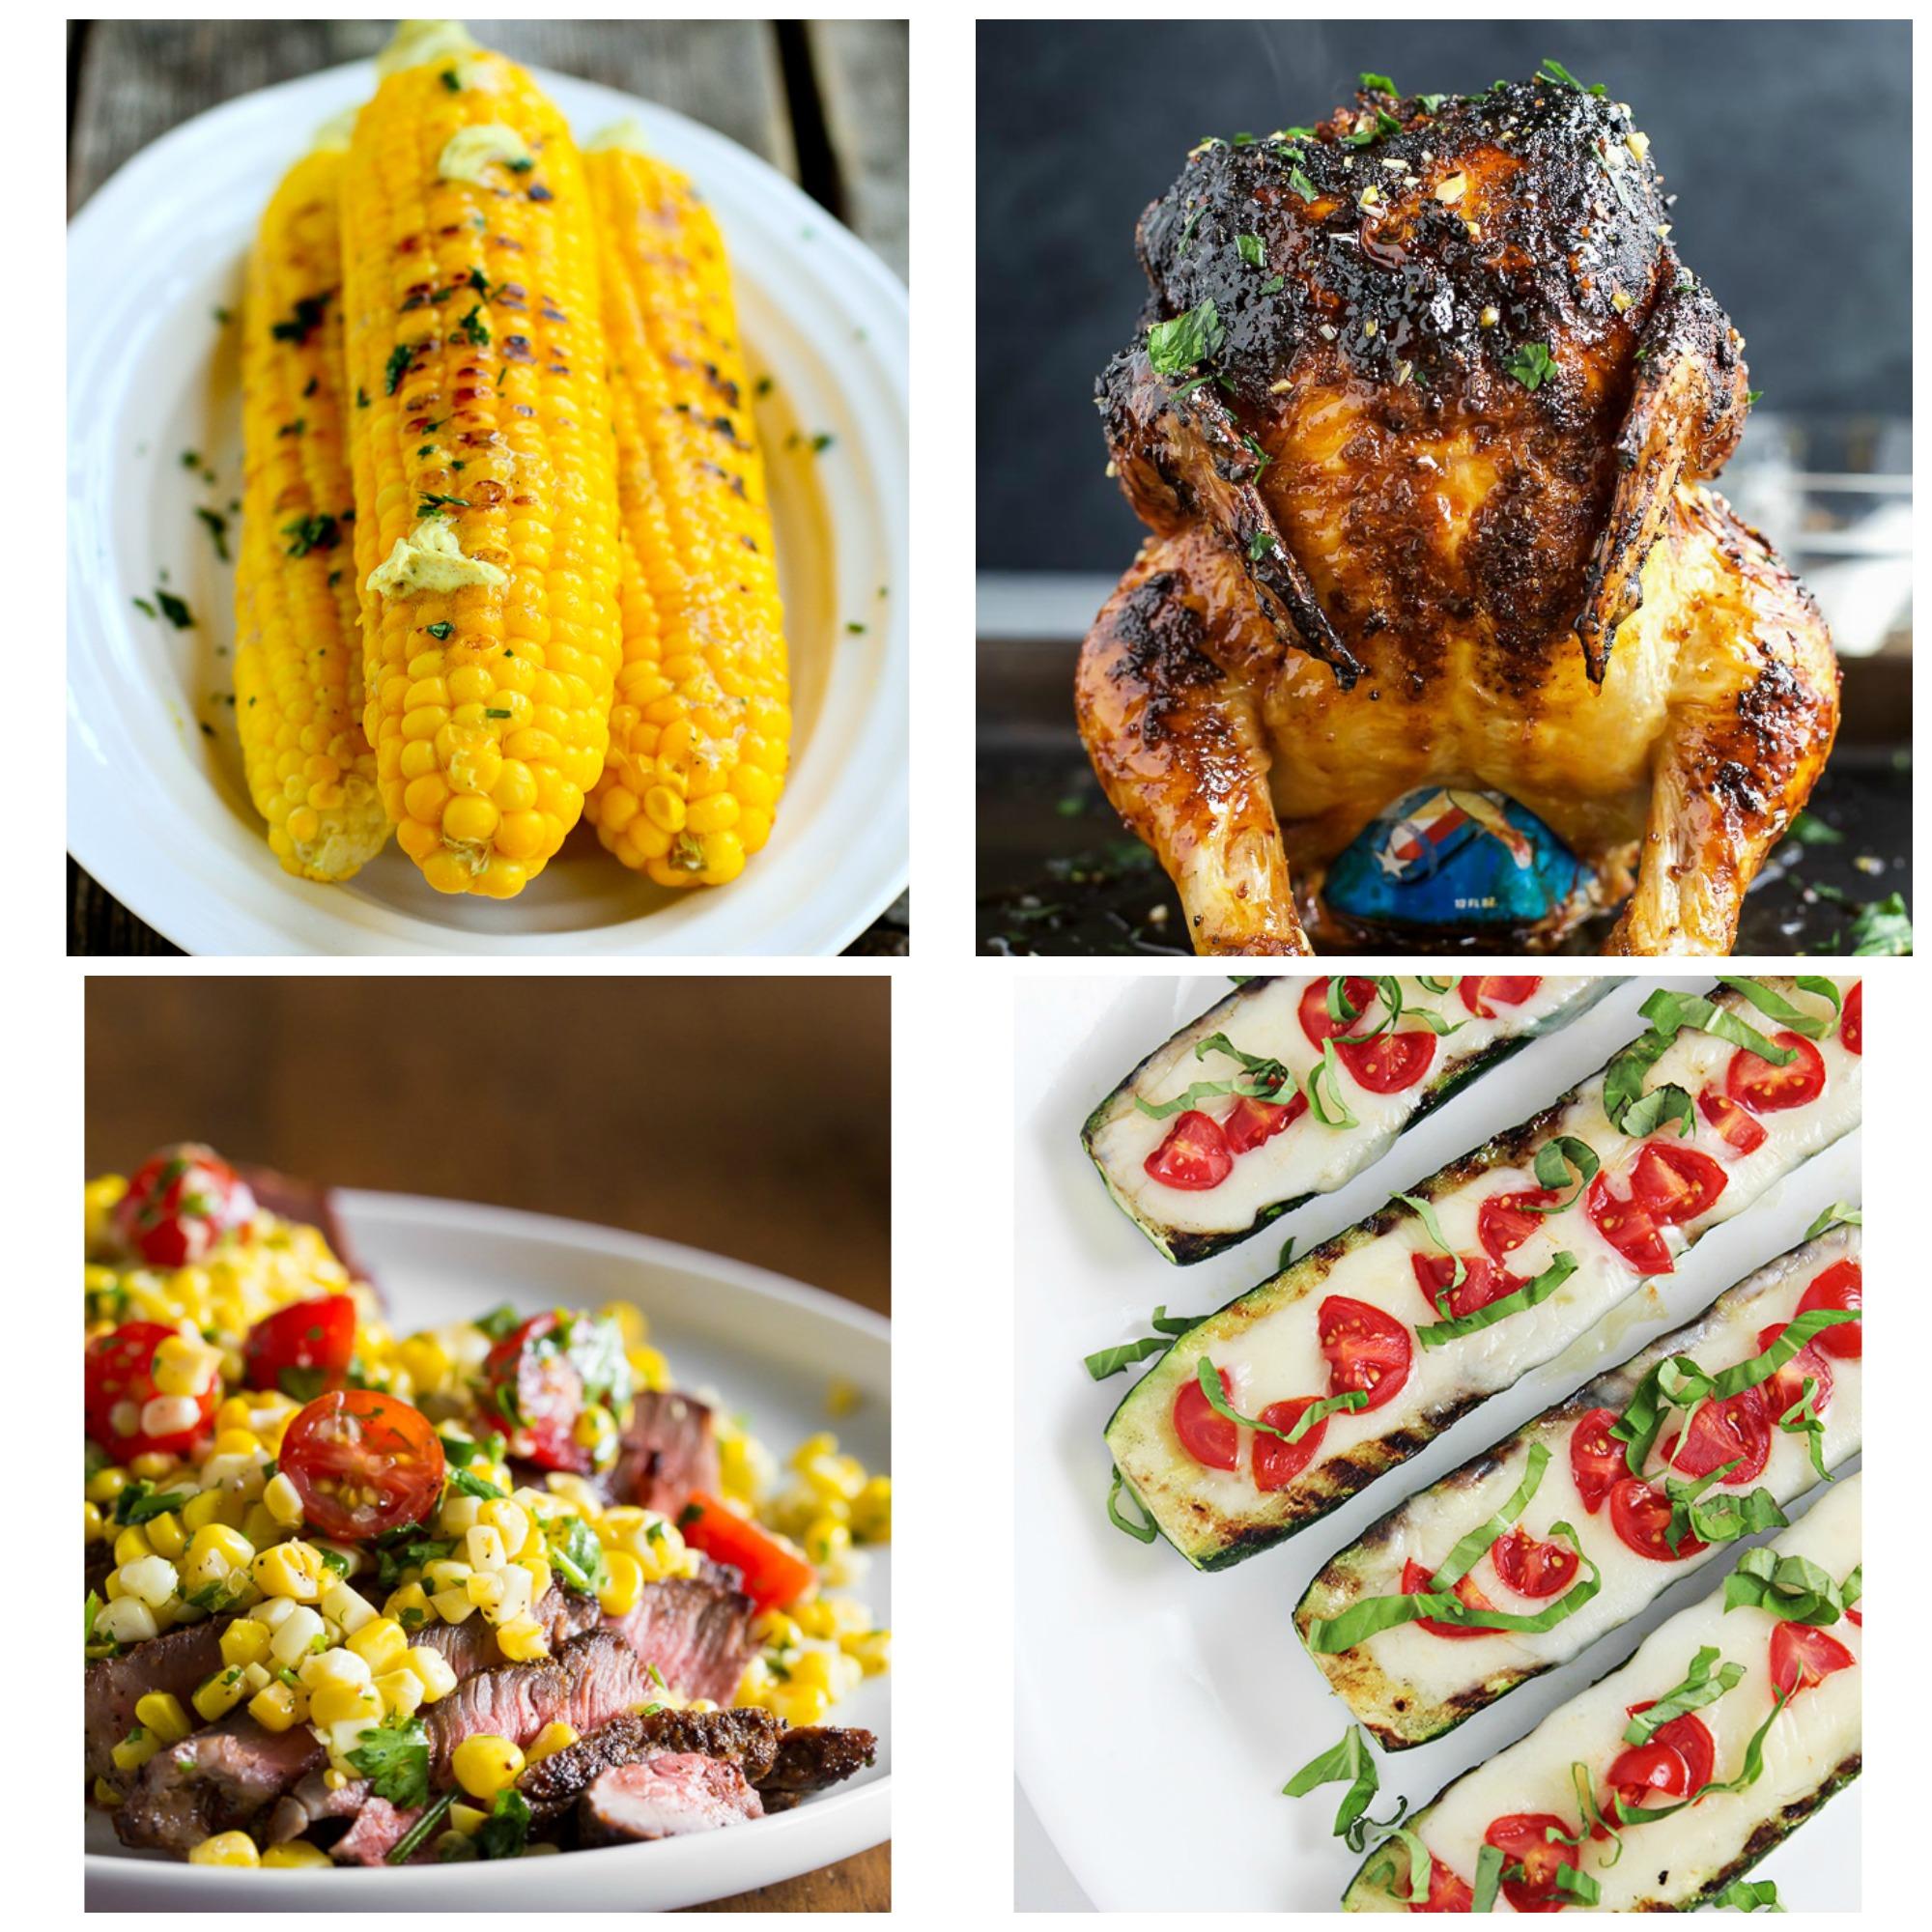 40 Top Summertime Favorites part 1; 2017 Jane Bonacci, The Heritage Cook